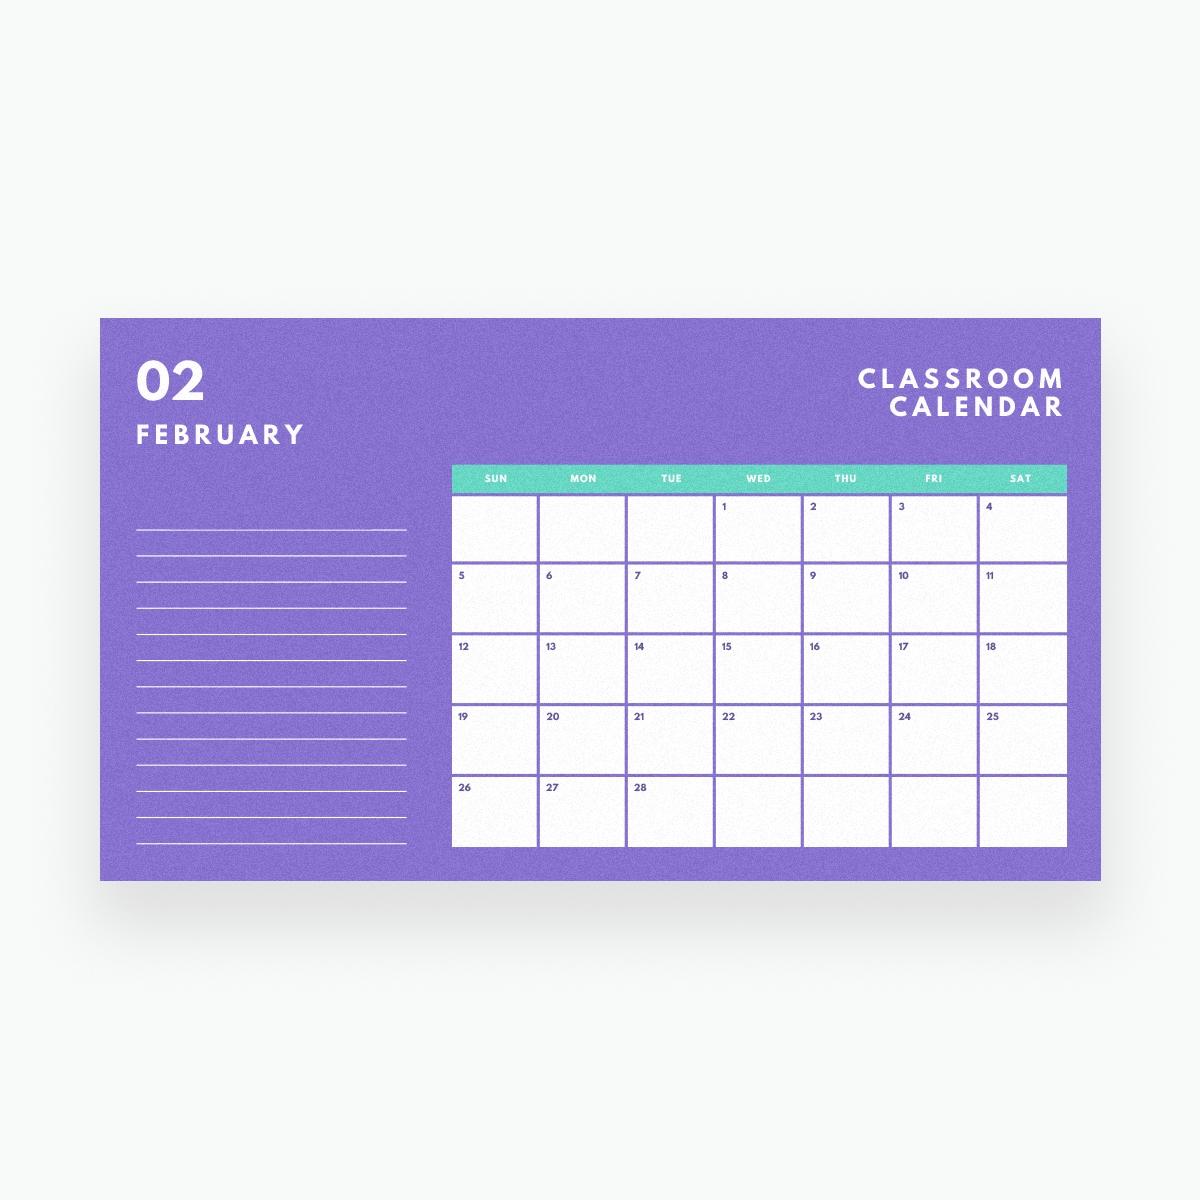 Design Custom Calendar Using Online Calendar Maker - Canva